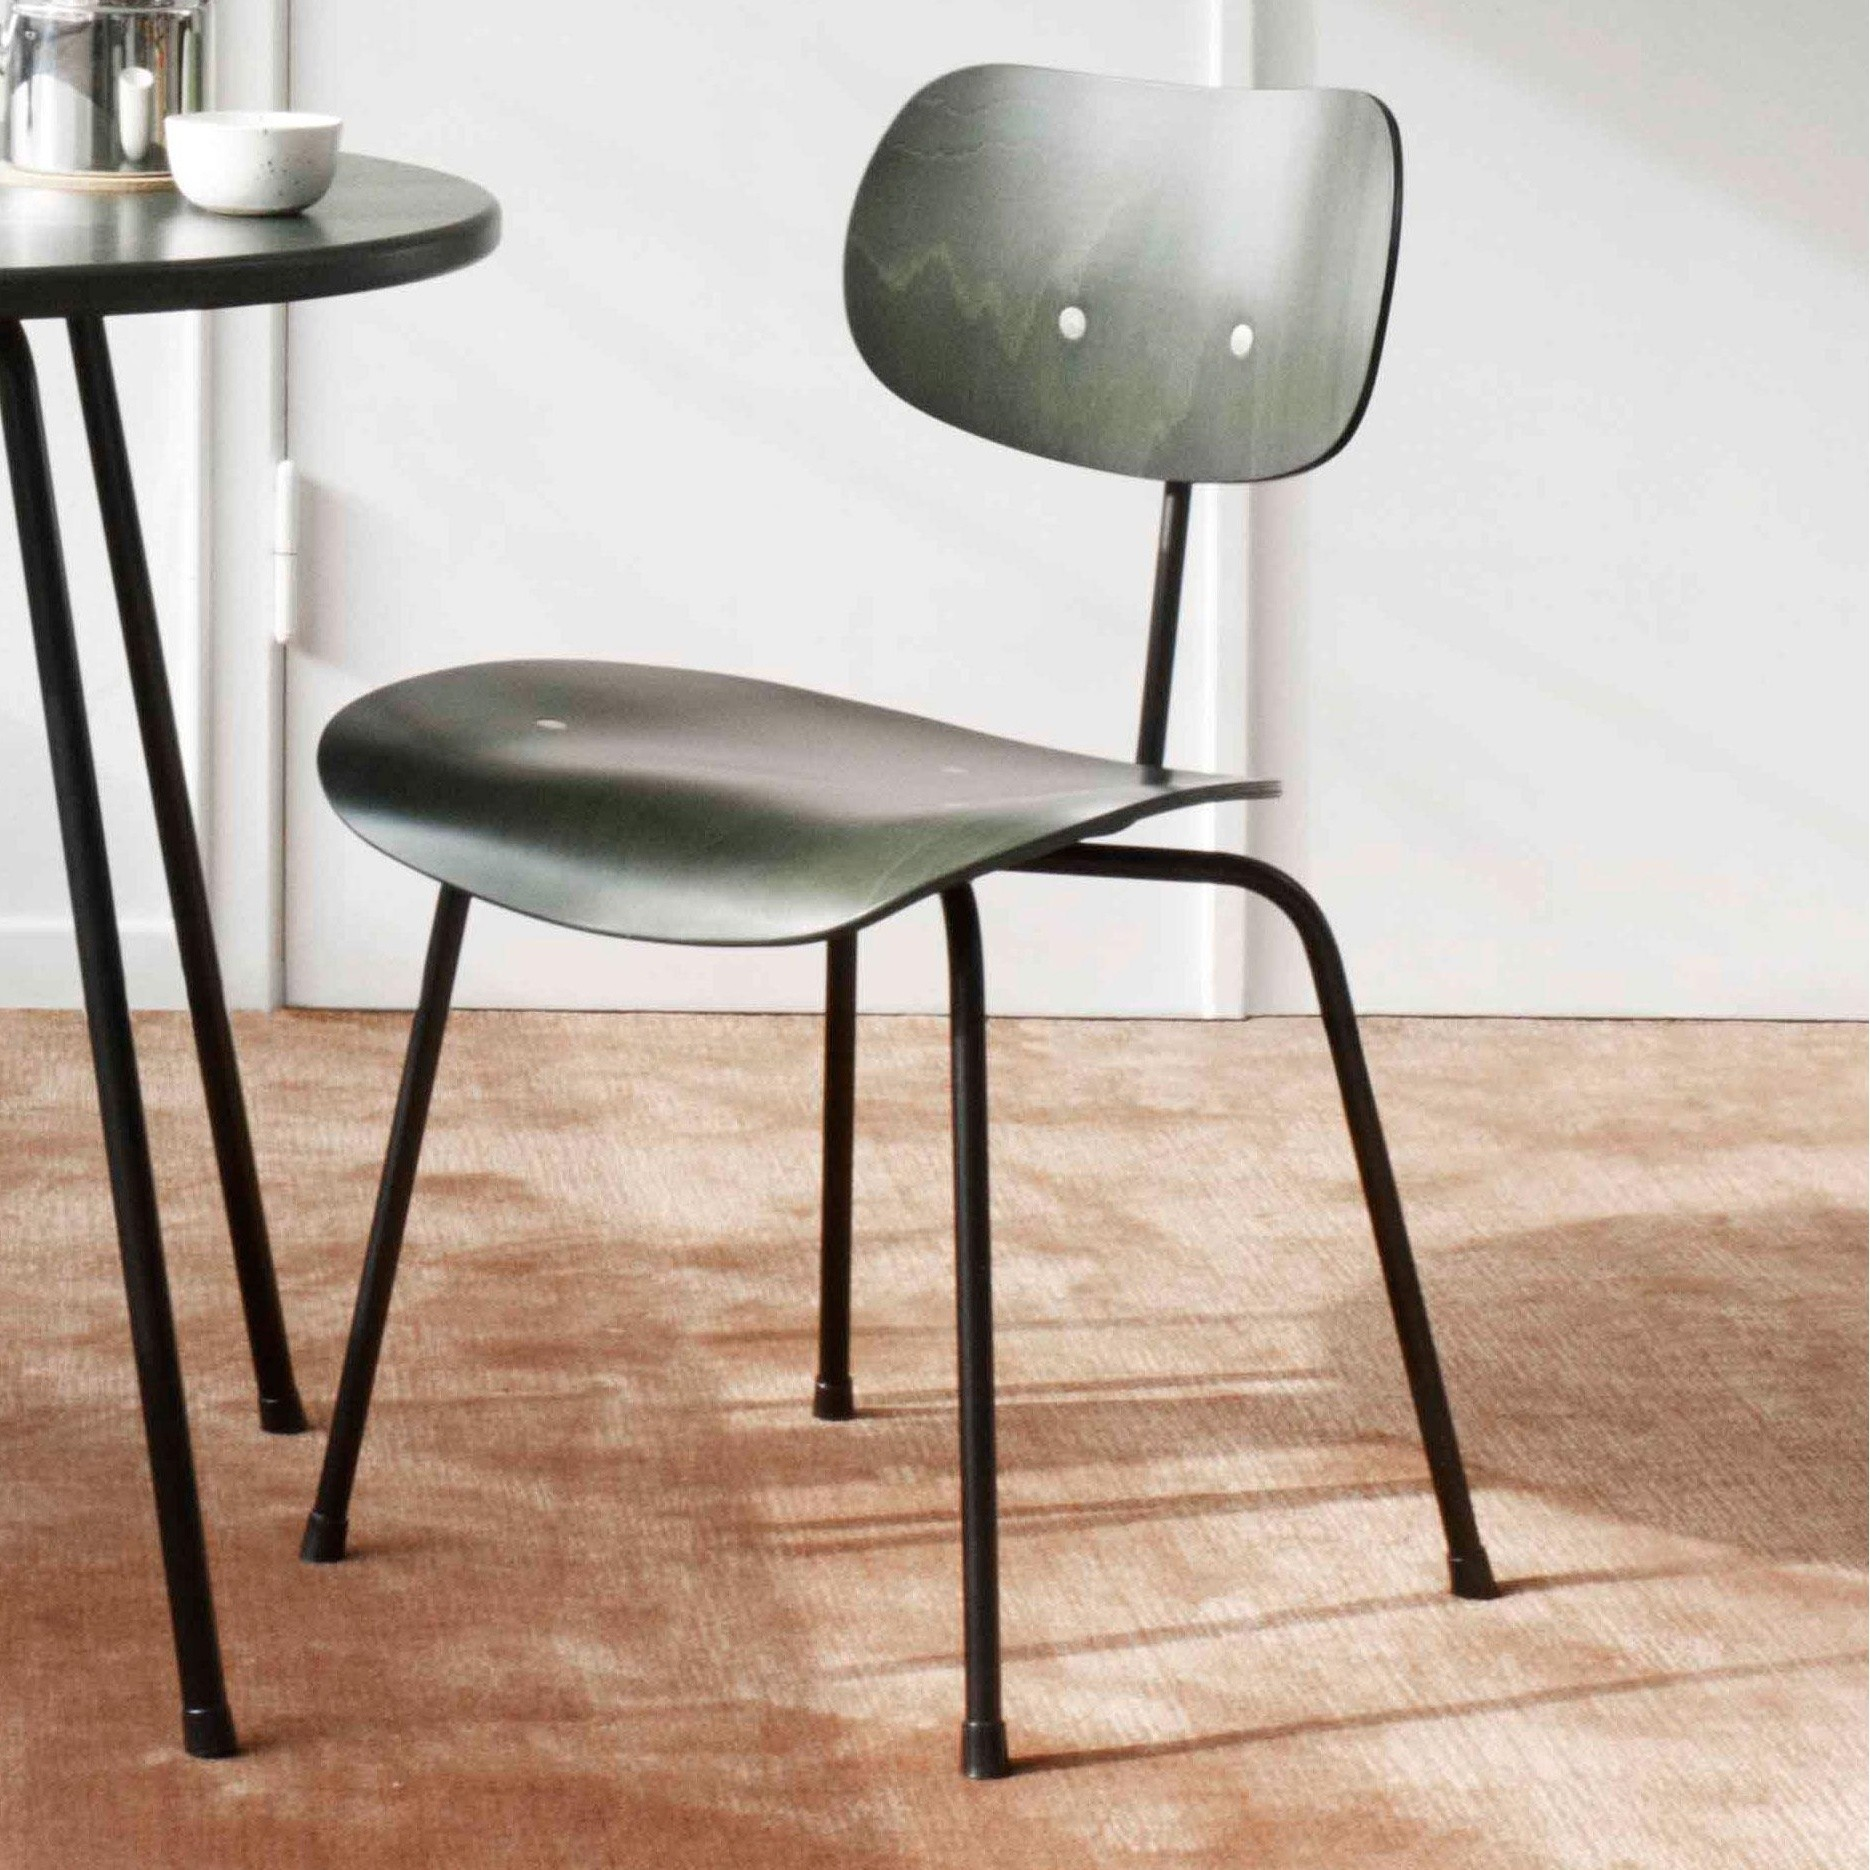 Wilde Spieth Eiermann Chair SE 68 Frame Black